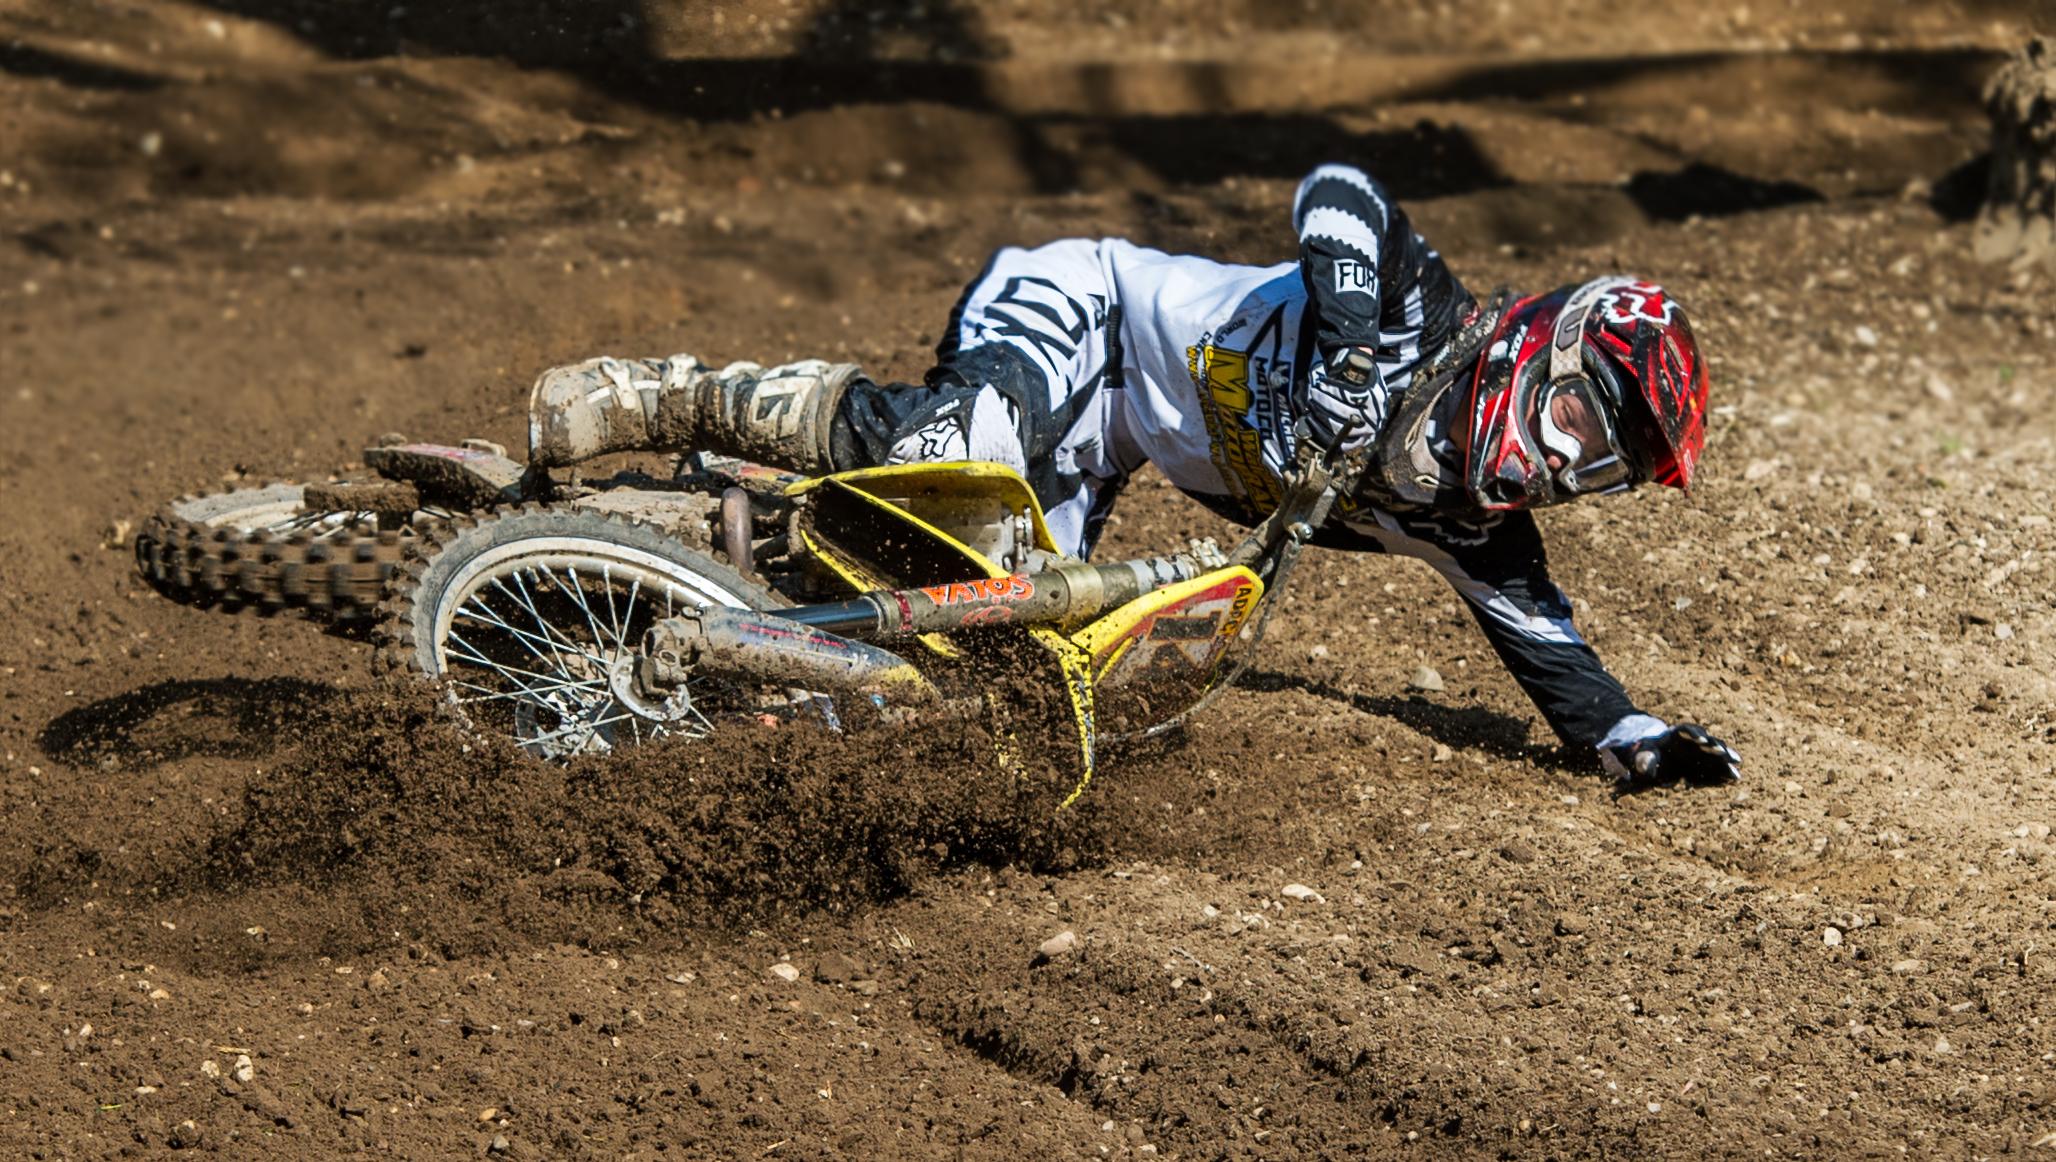 спорт мотоцикл гонка sports motorcycle race  № 3296421 без смс